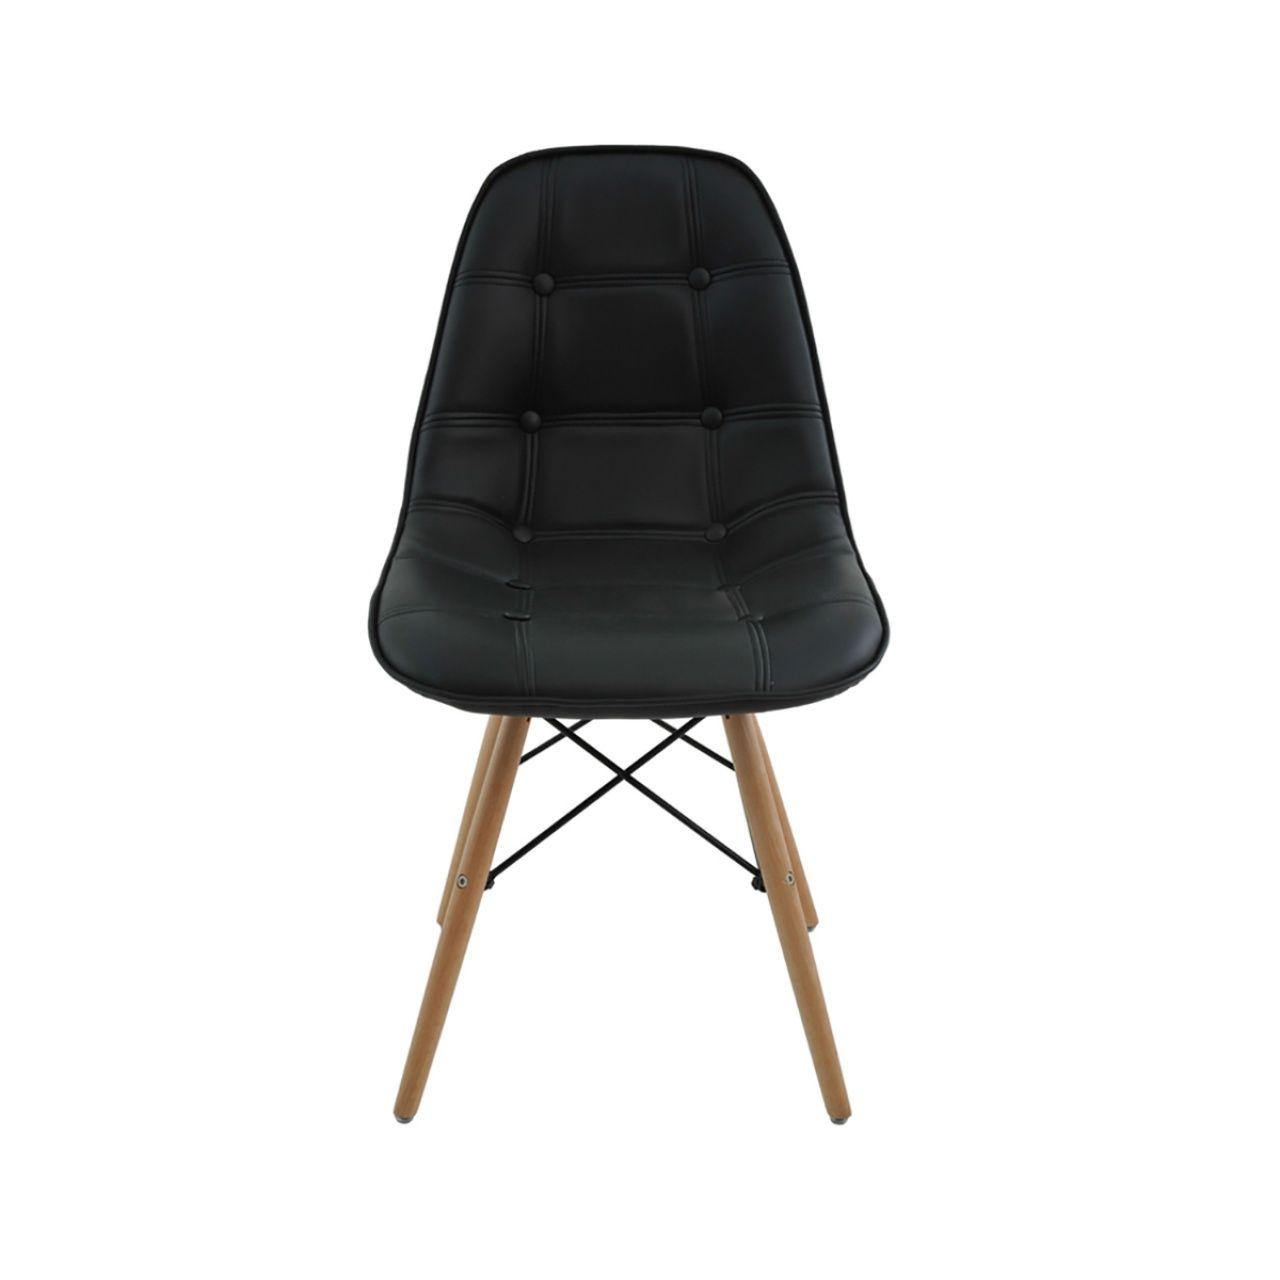 Cadeira Eames Eiffel Rivatti sem braço Botonê